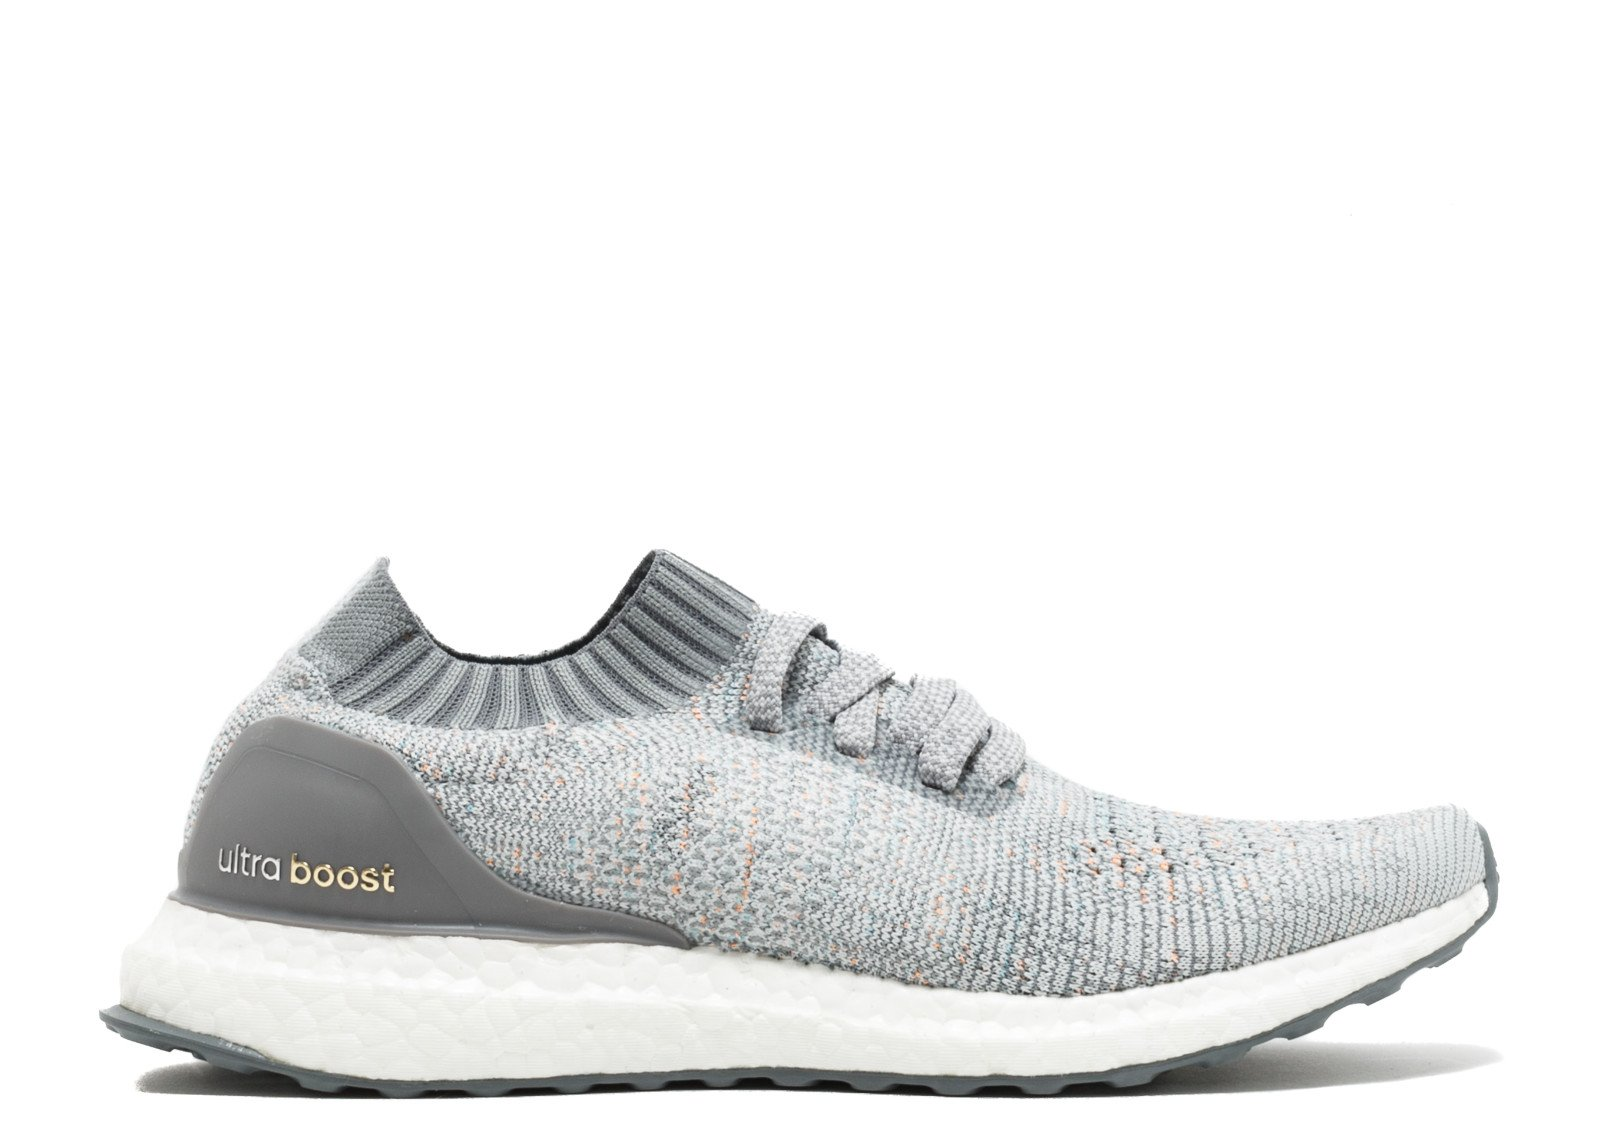 71pk281ud6L - adidas Men's Ultraboost Uncaged Running Shoe (Grey)